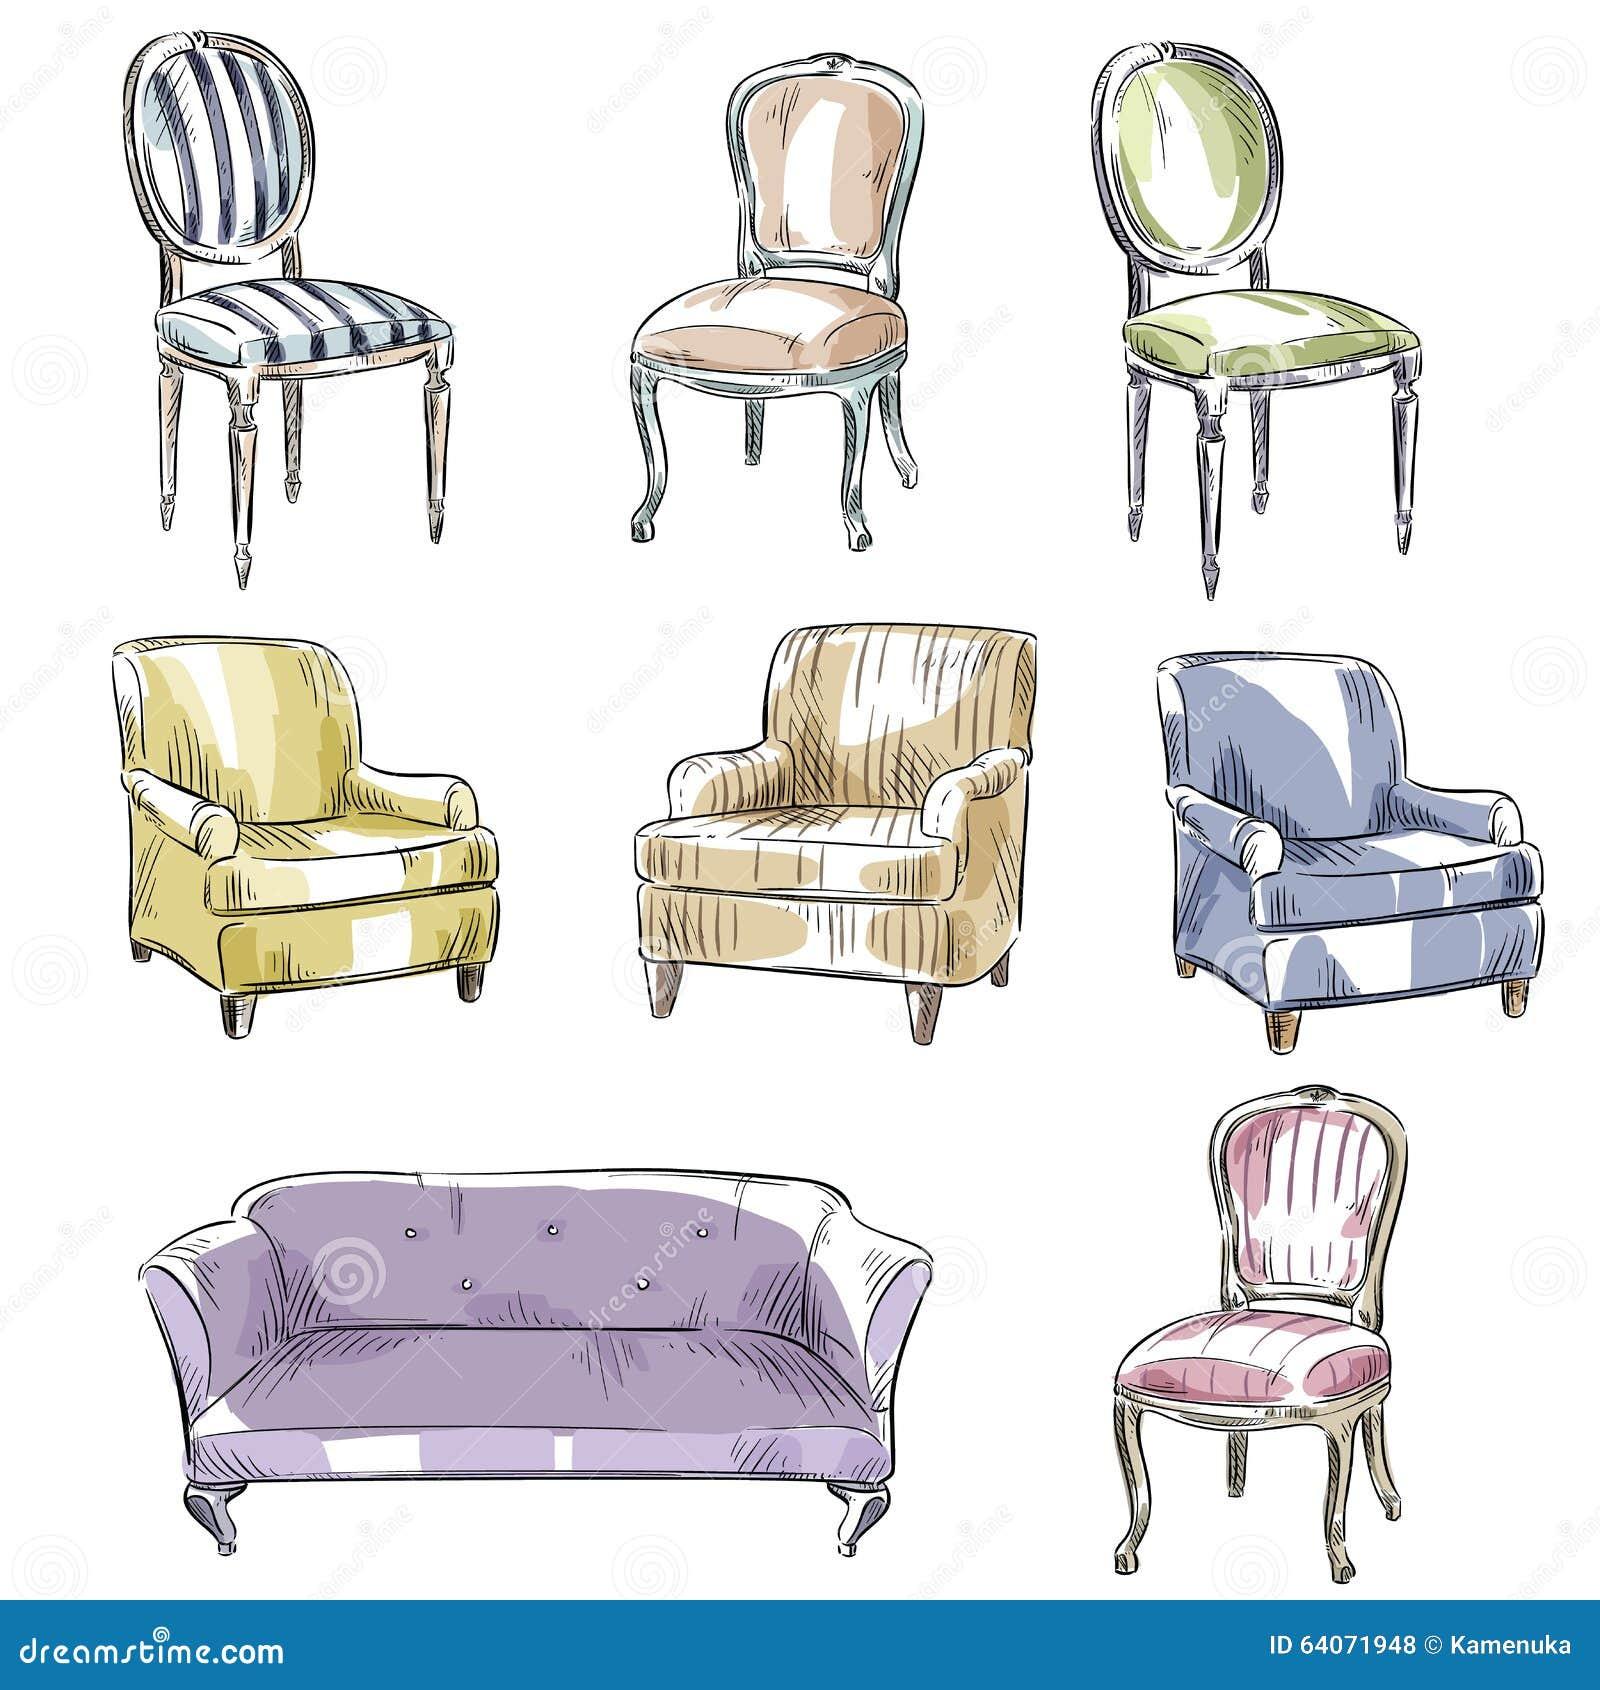 sofa gezeichnet. Black Bedroom Furniture Sets. Home Design Ideas